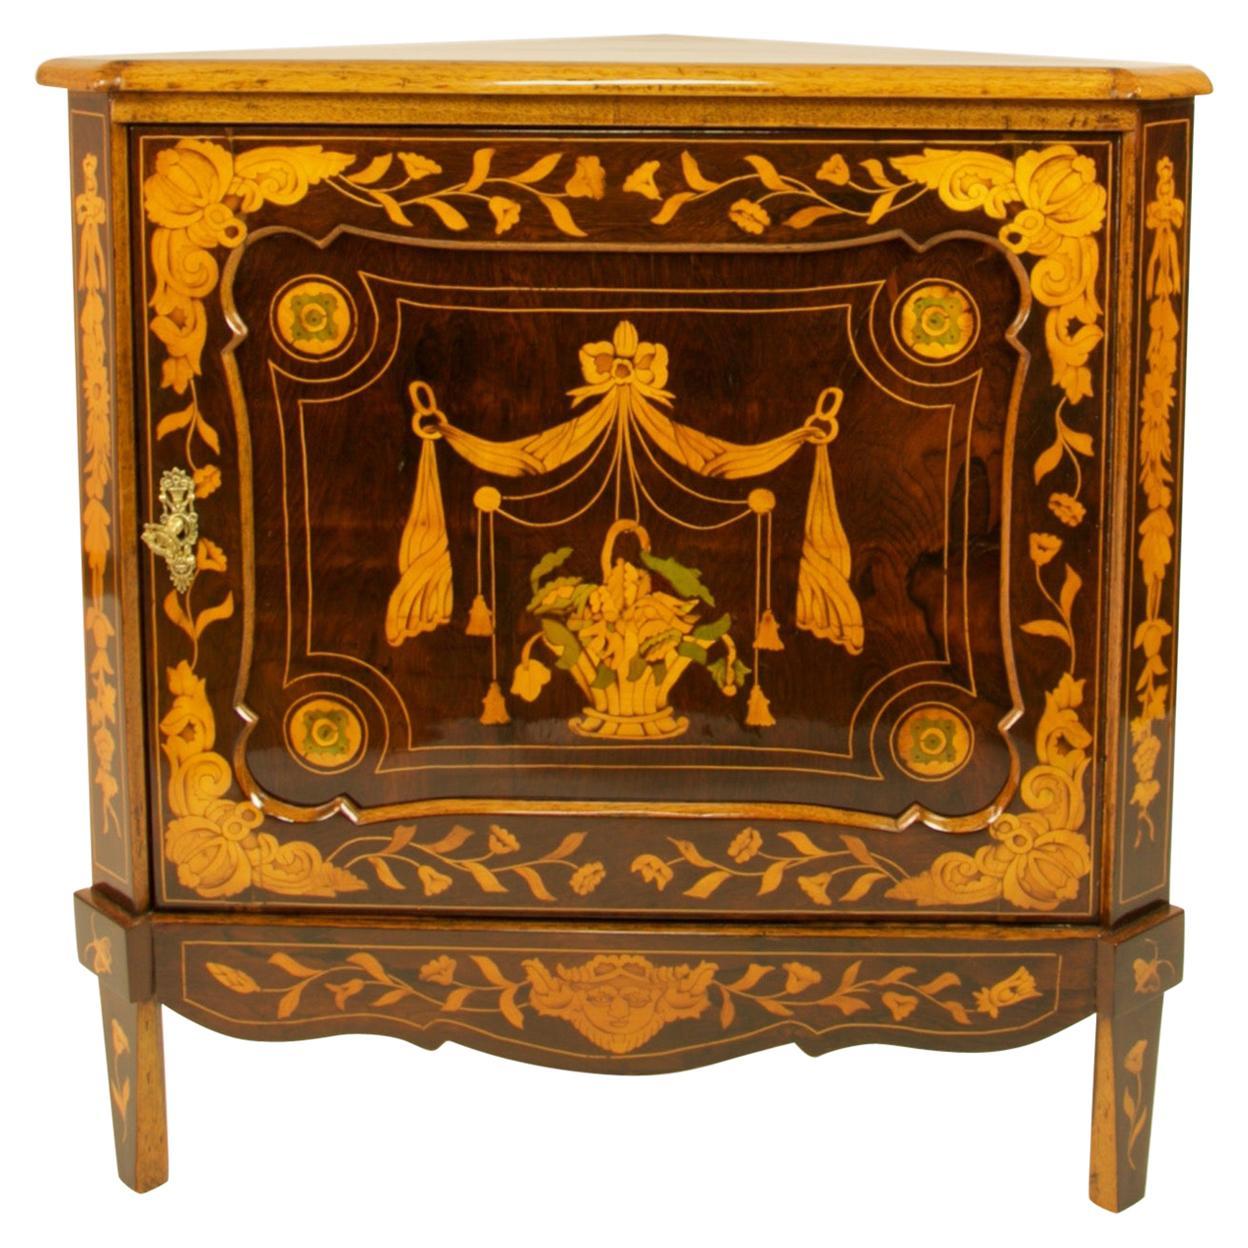 Dutch Louis XVI Marquetry Corner Cabinet or Encoignure